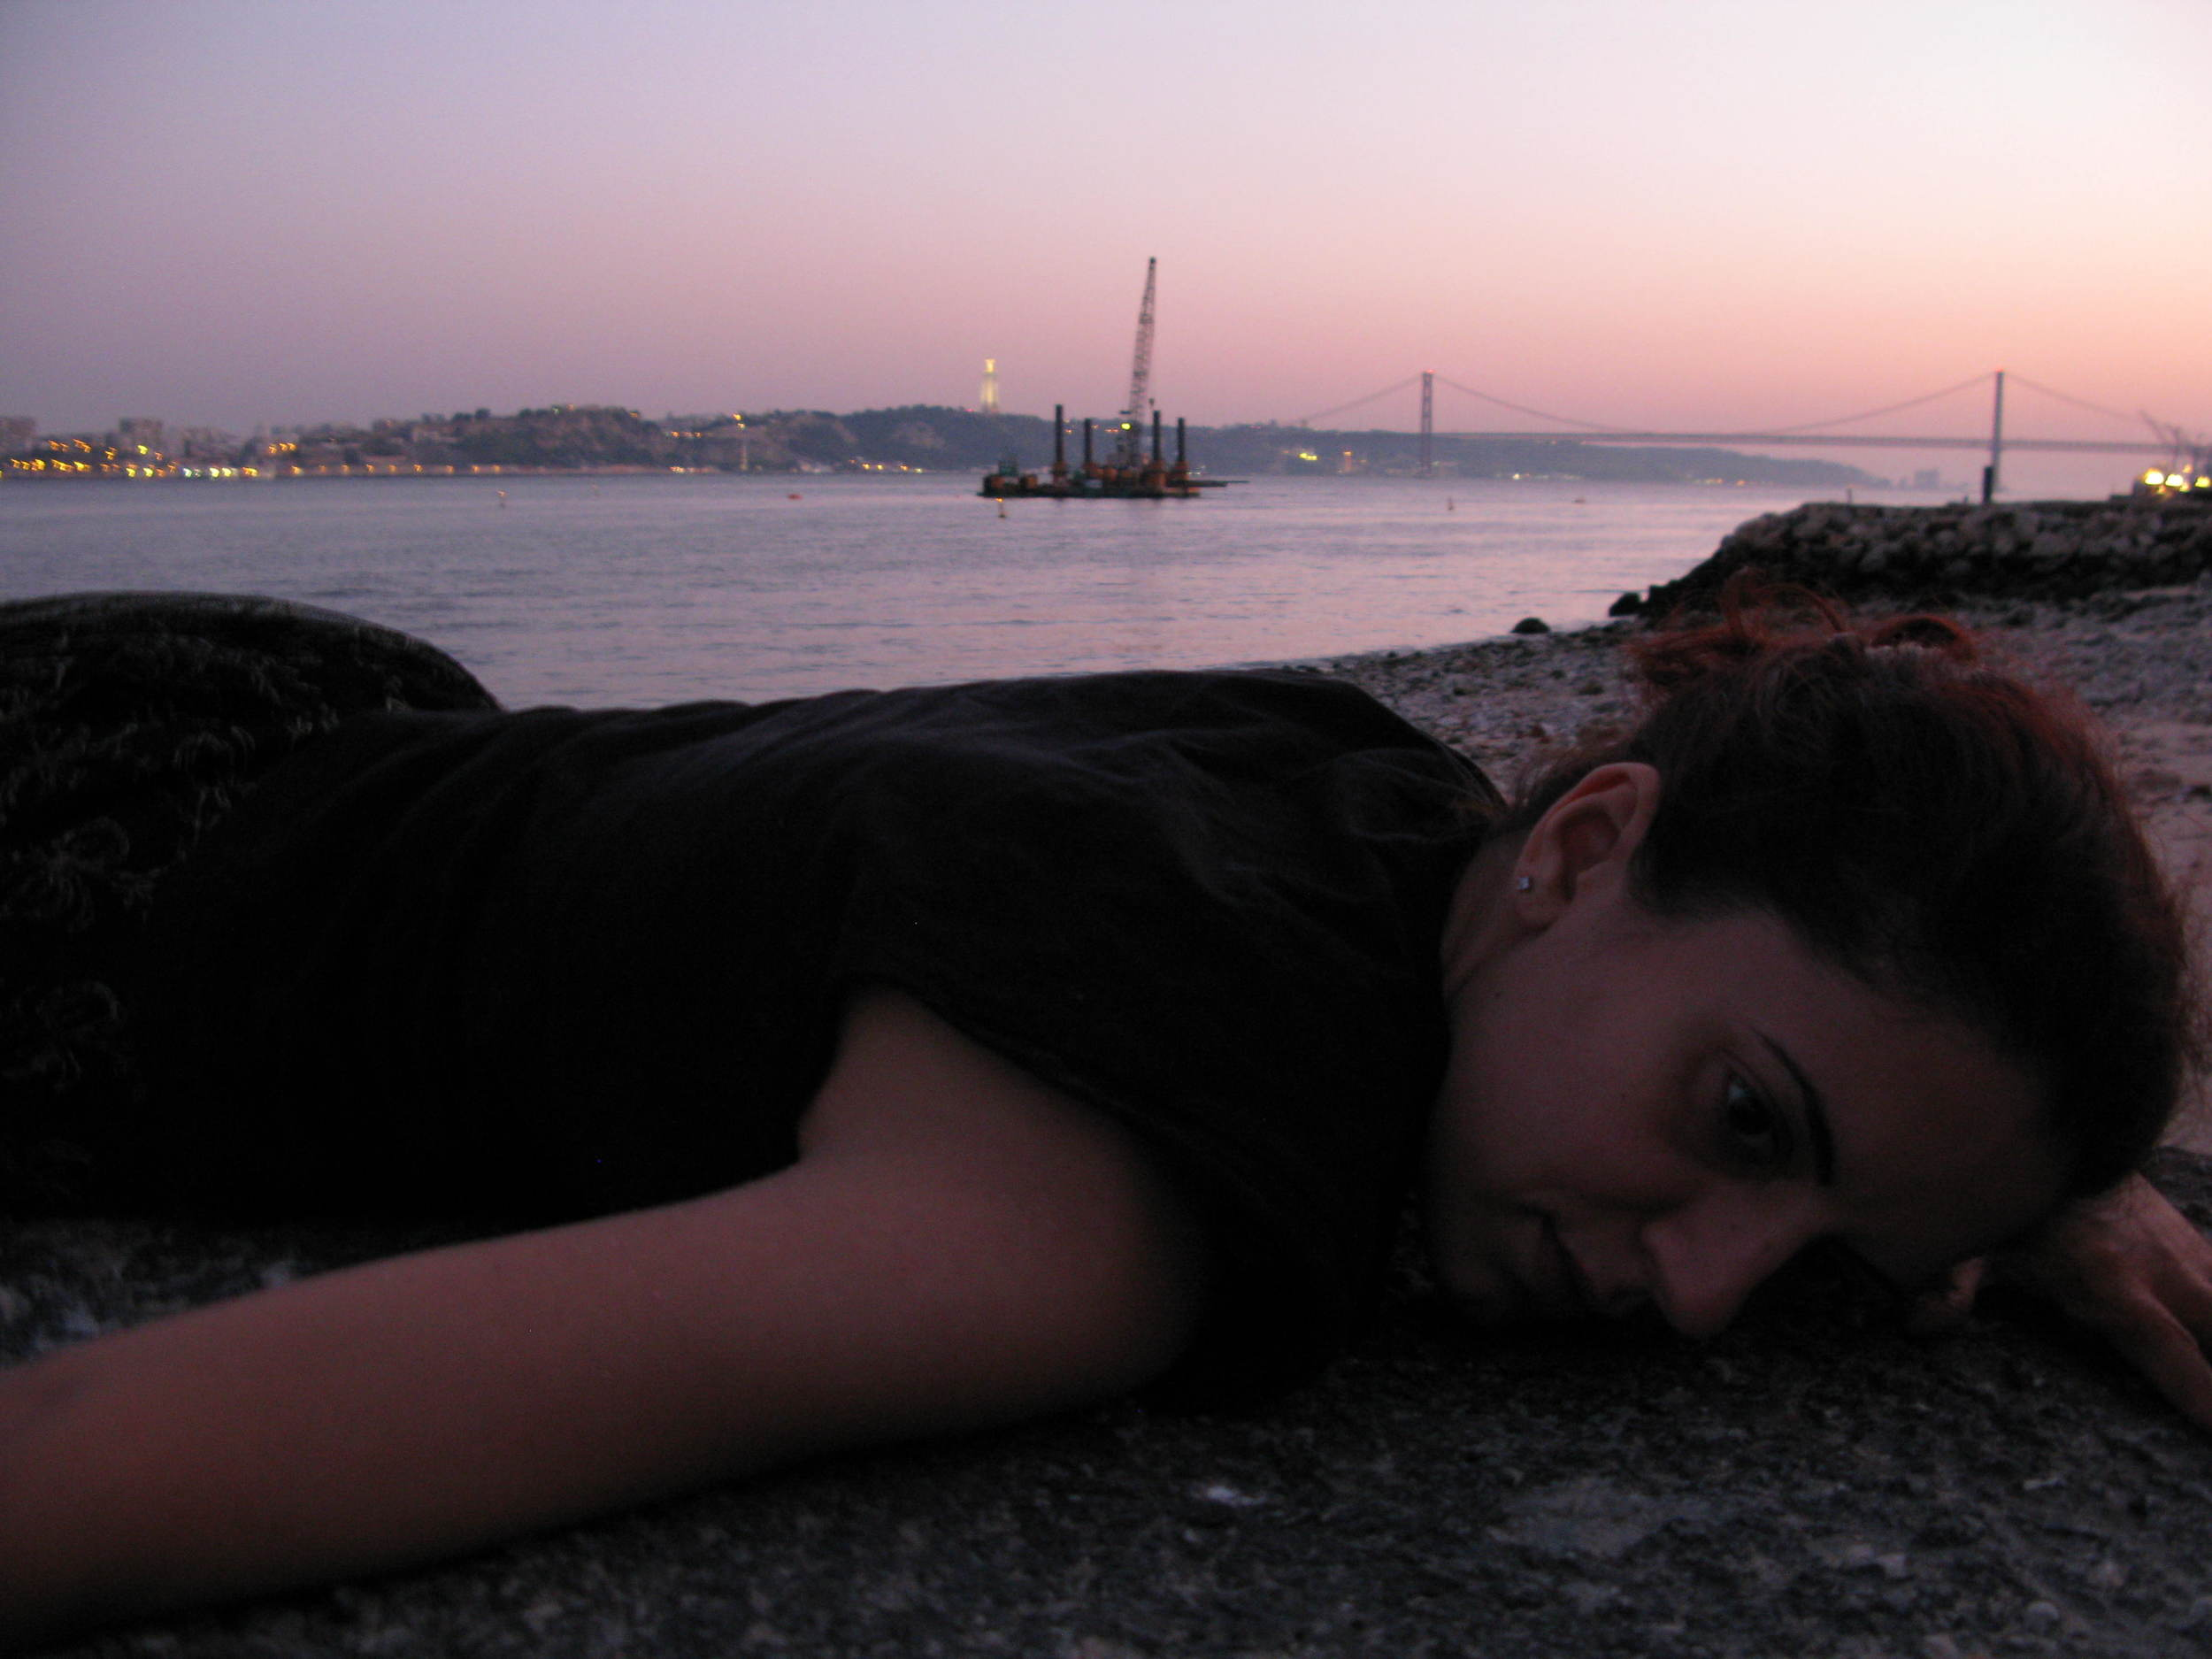 Body of Time 6, Sofia Varino, Photography, 12 x 15, $100.jpg